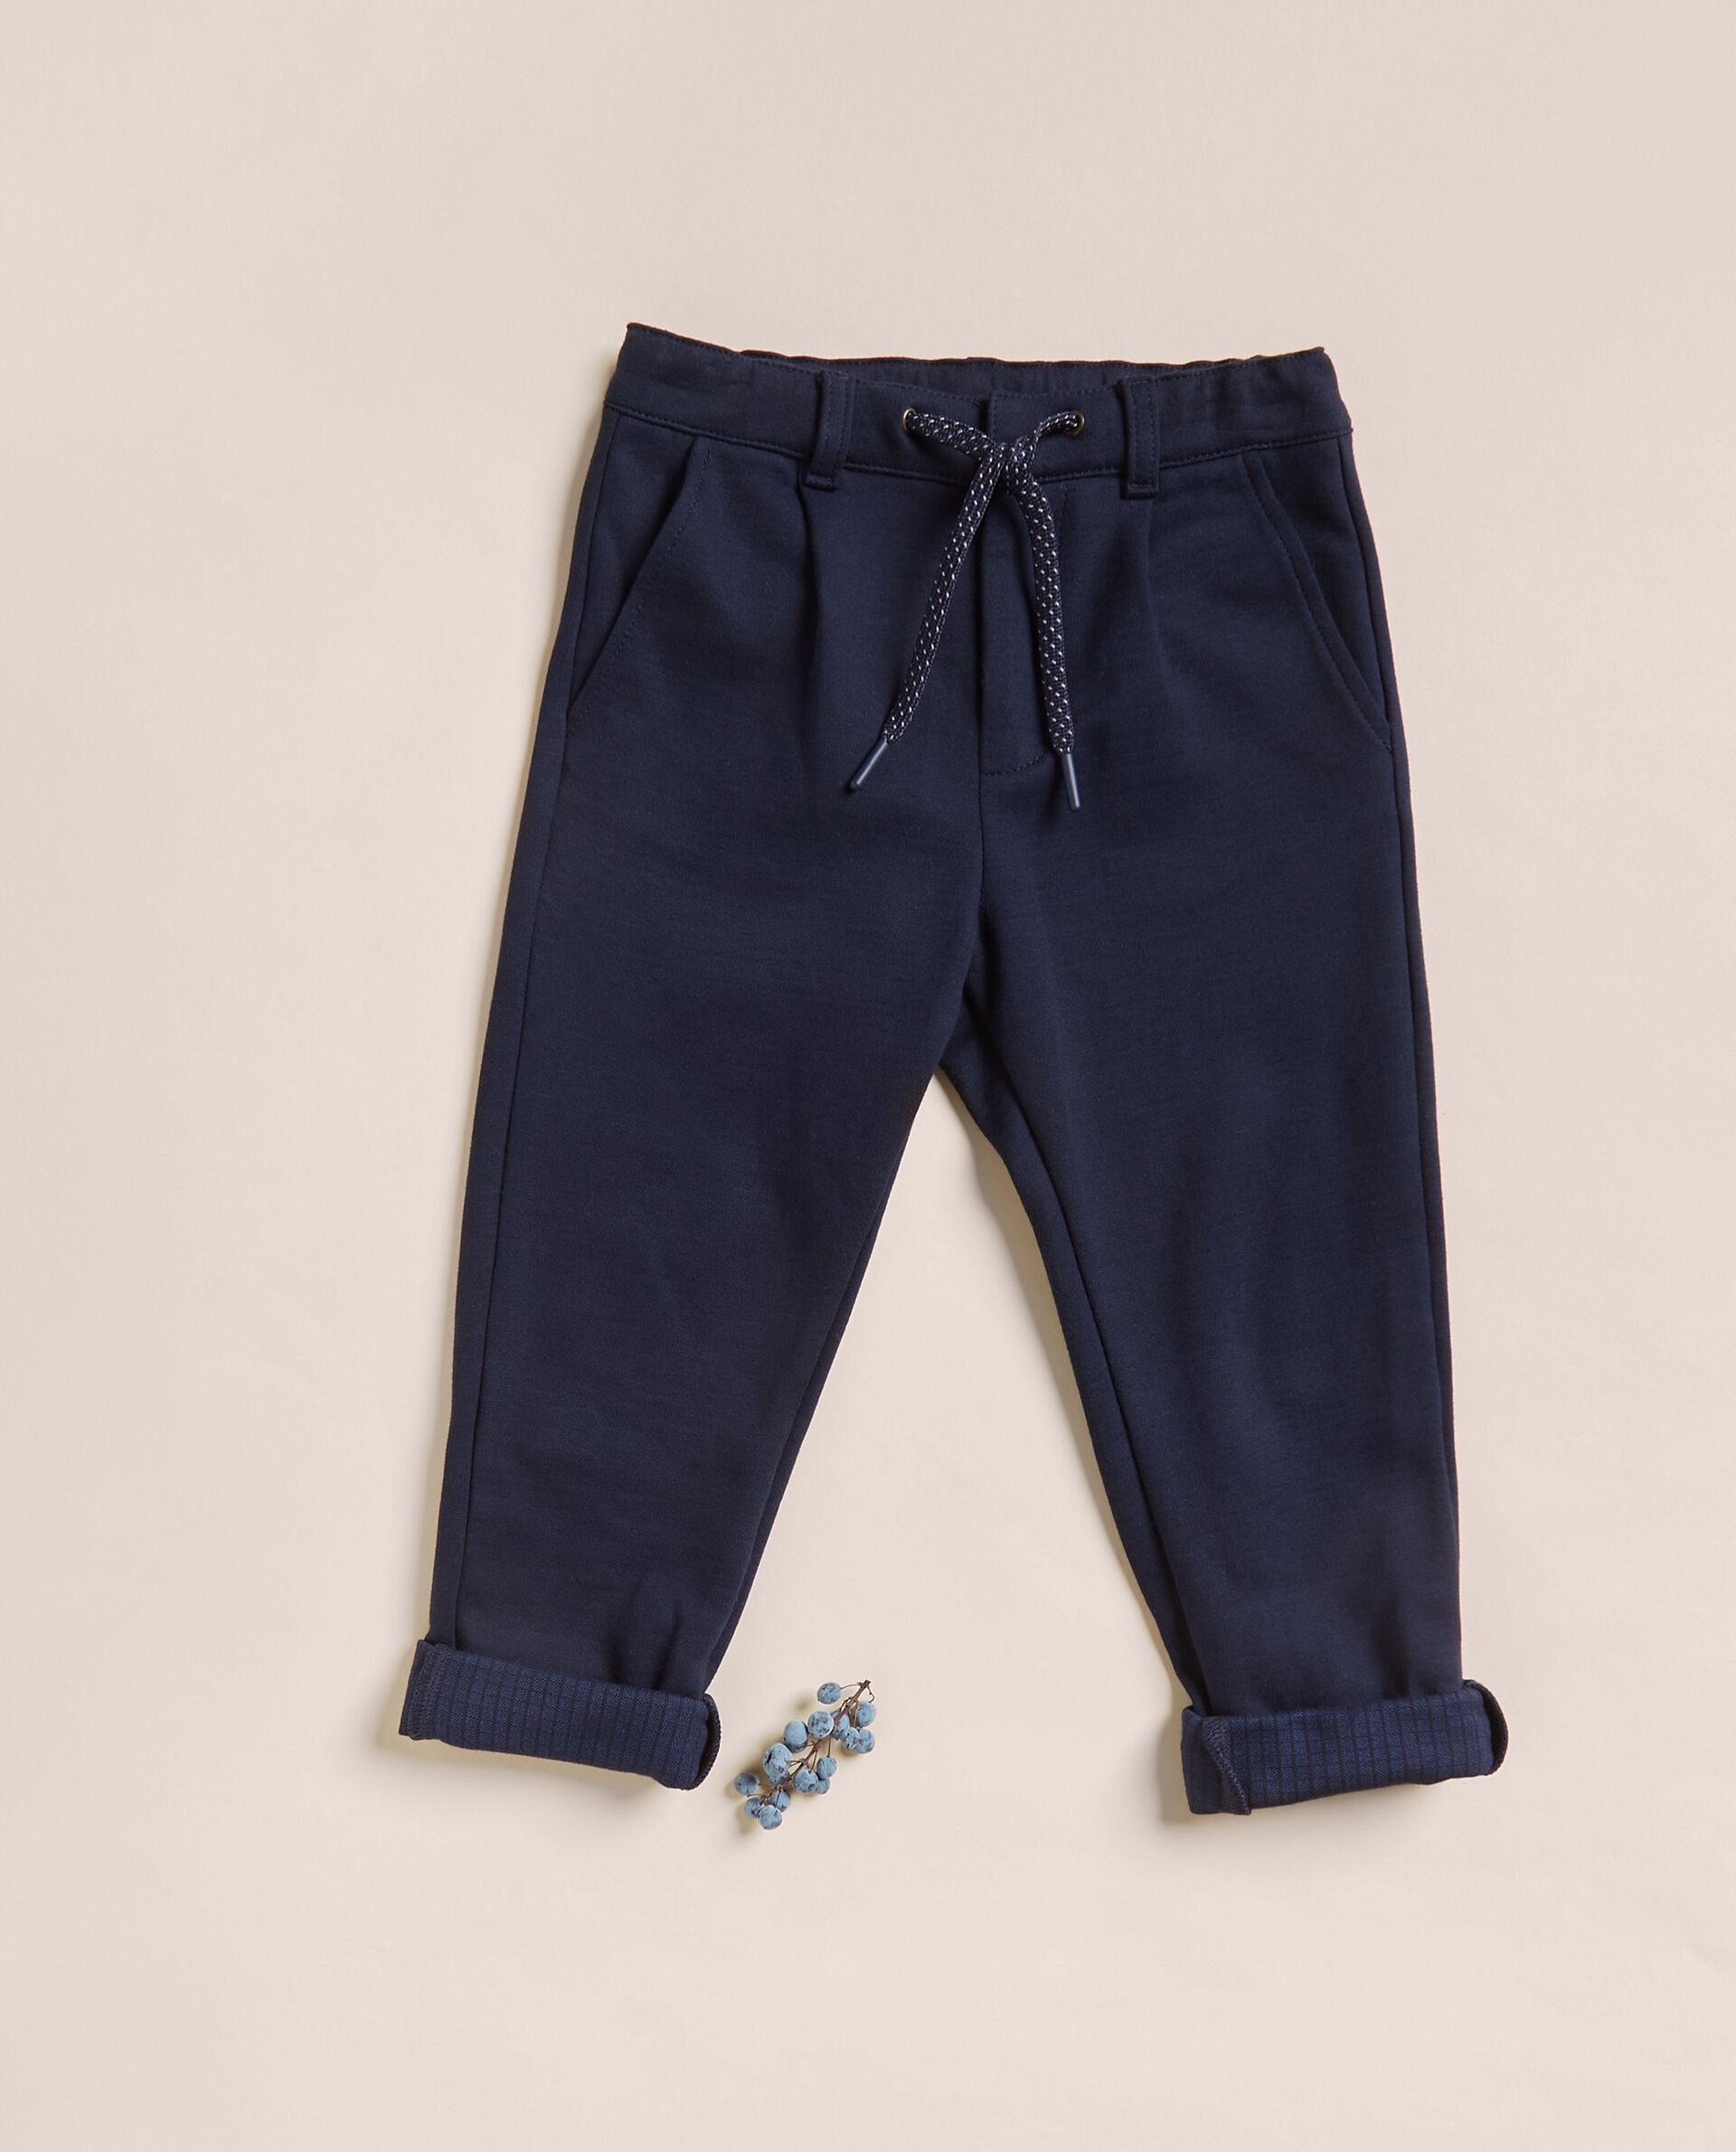 Pantalone punto milano con coulisse IANA